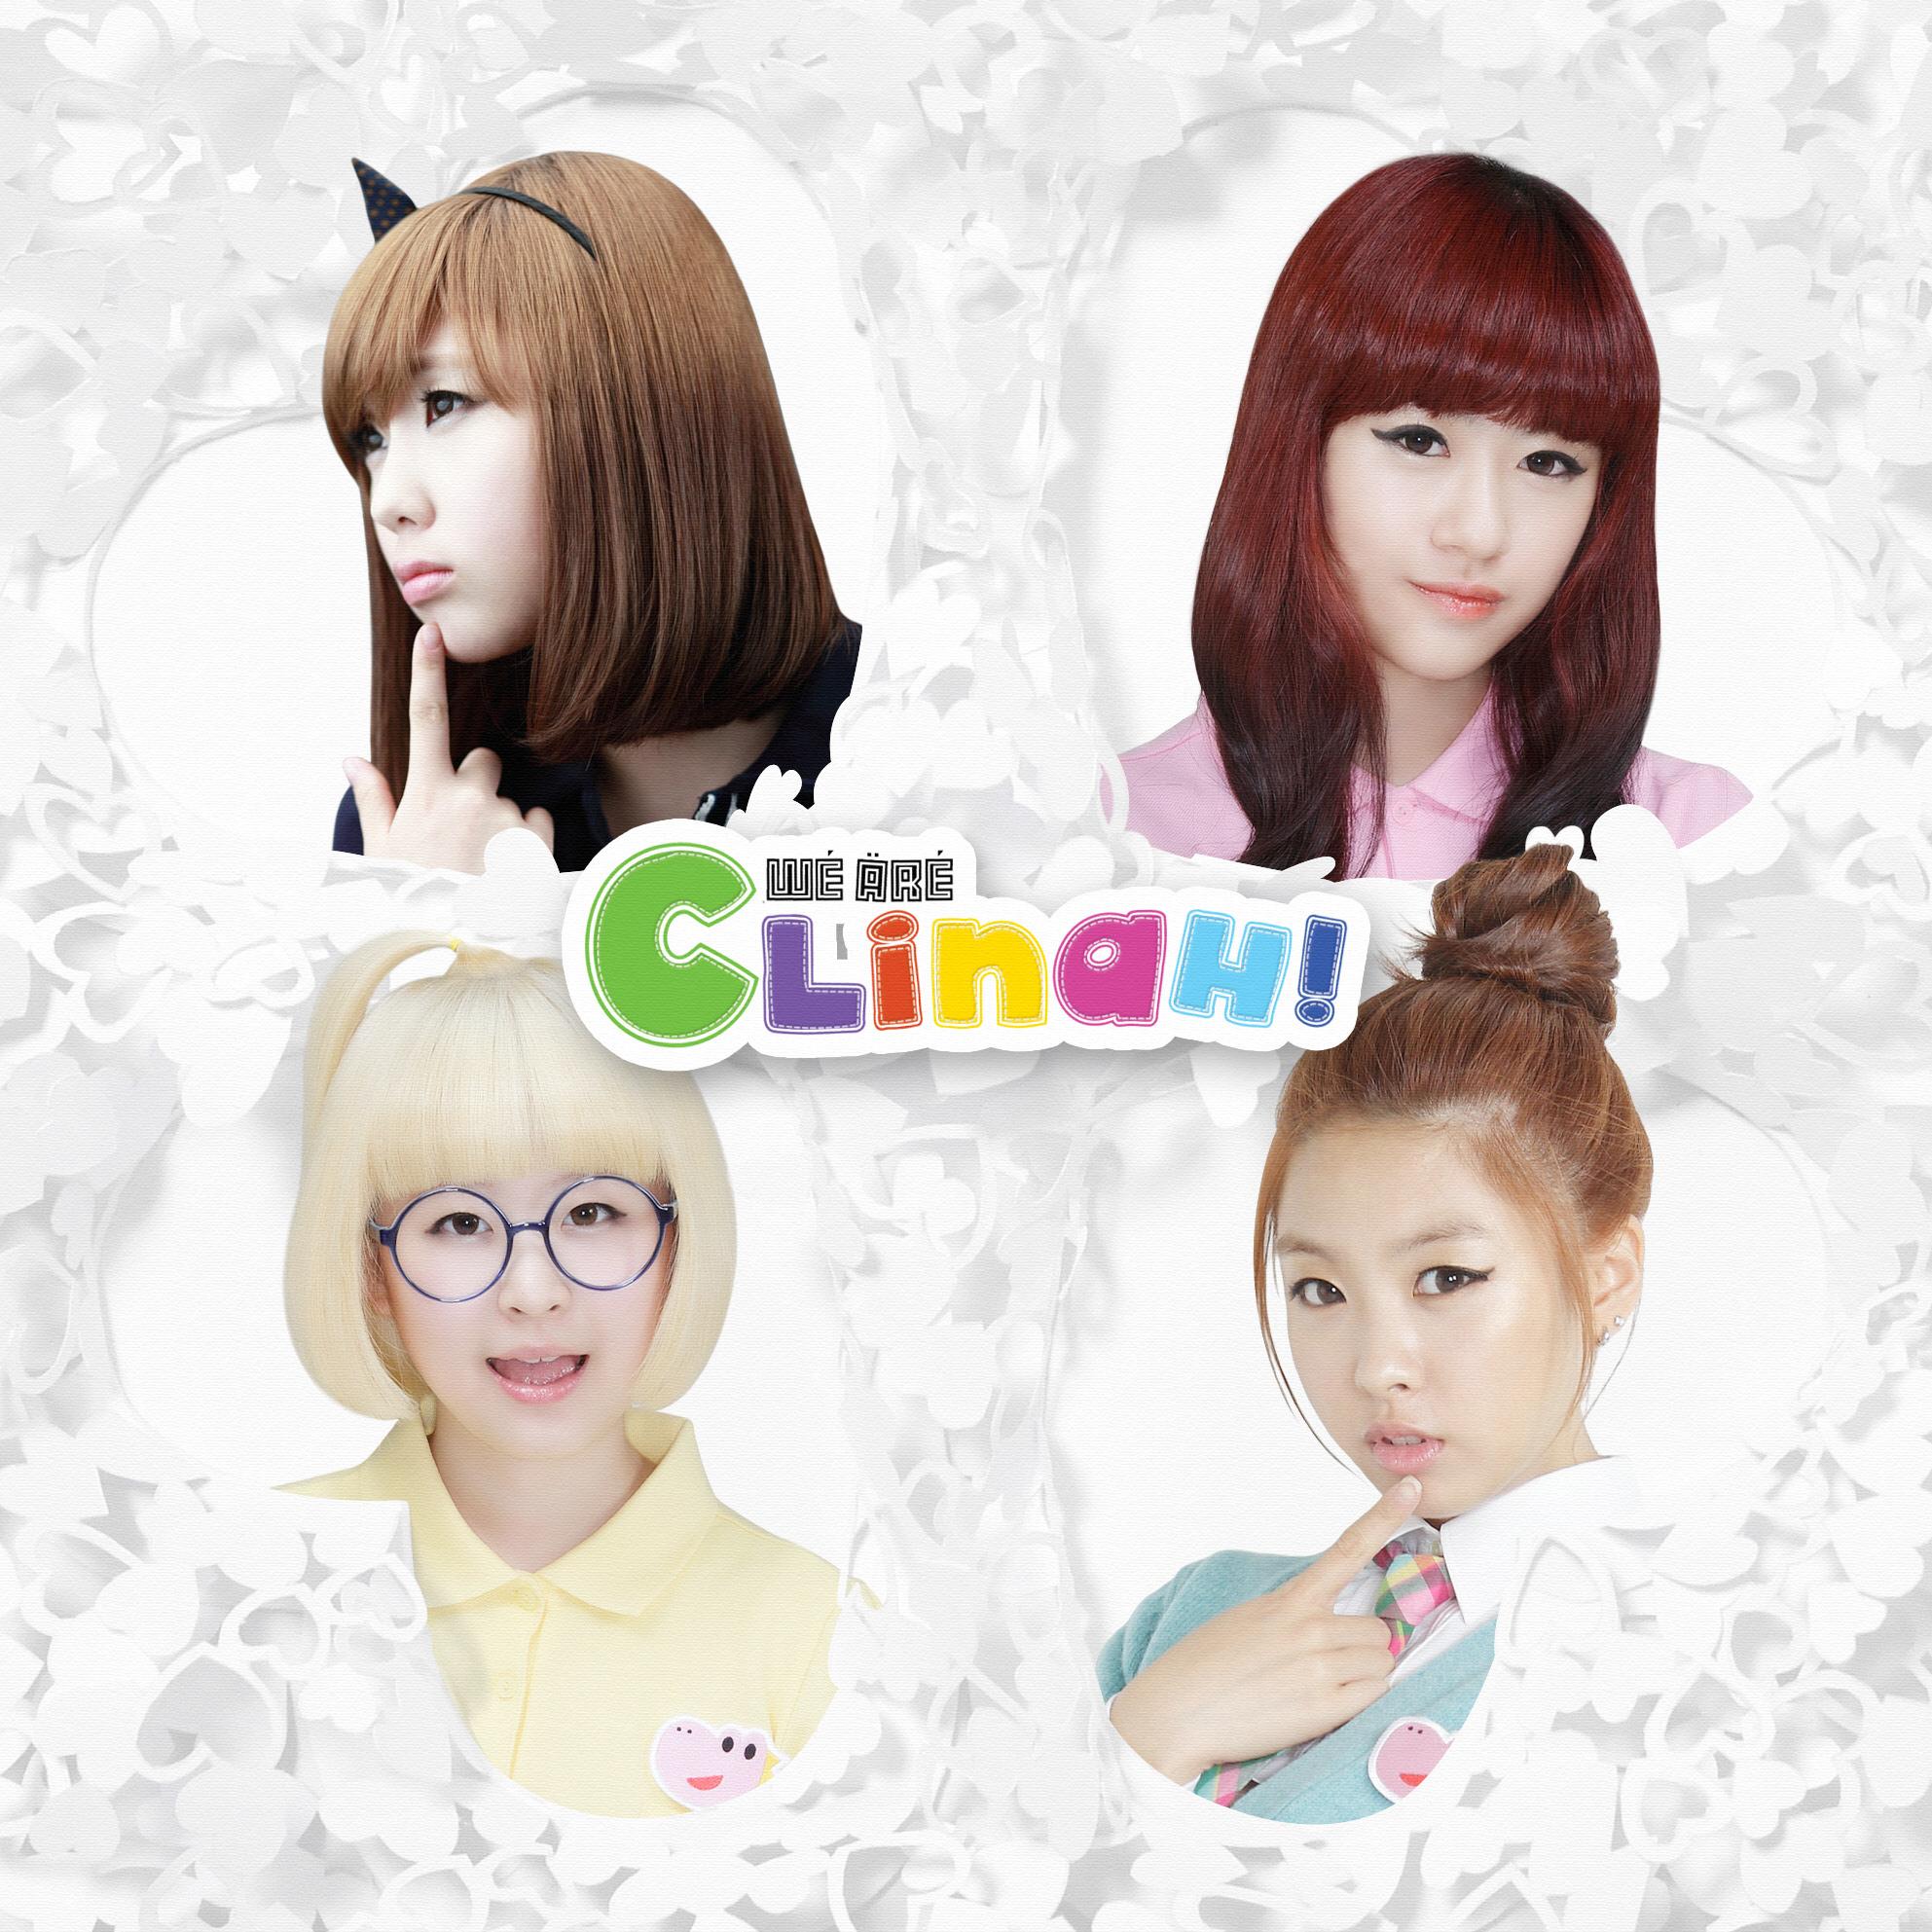 "Clinah >> mini-álbum debut ""We Are CLINAH!"" 311126"